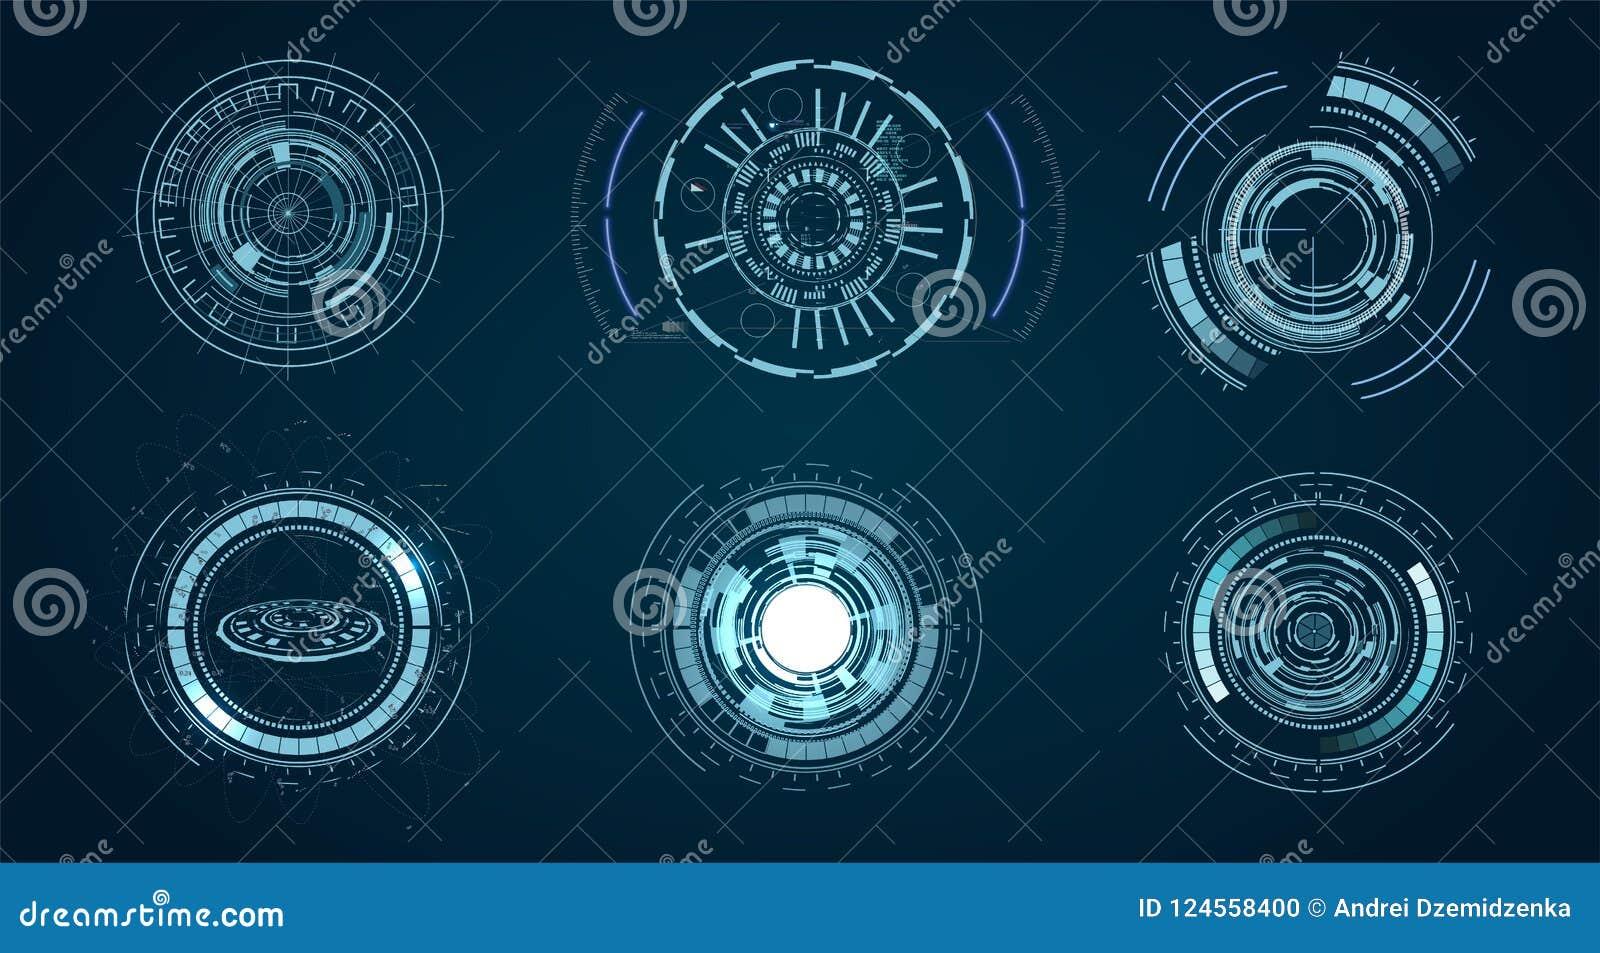 Technologische HUD-elementen, futuristische interface virtuele werkelijkheid Hud futuristisch malplaatje cirkel digitaal van tech